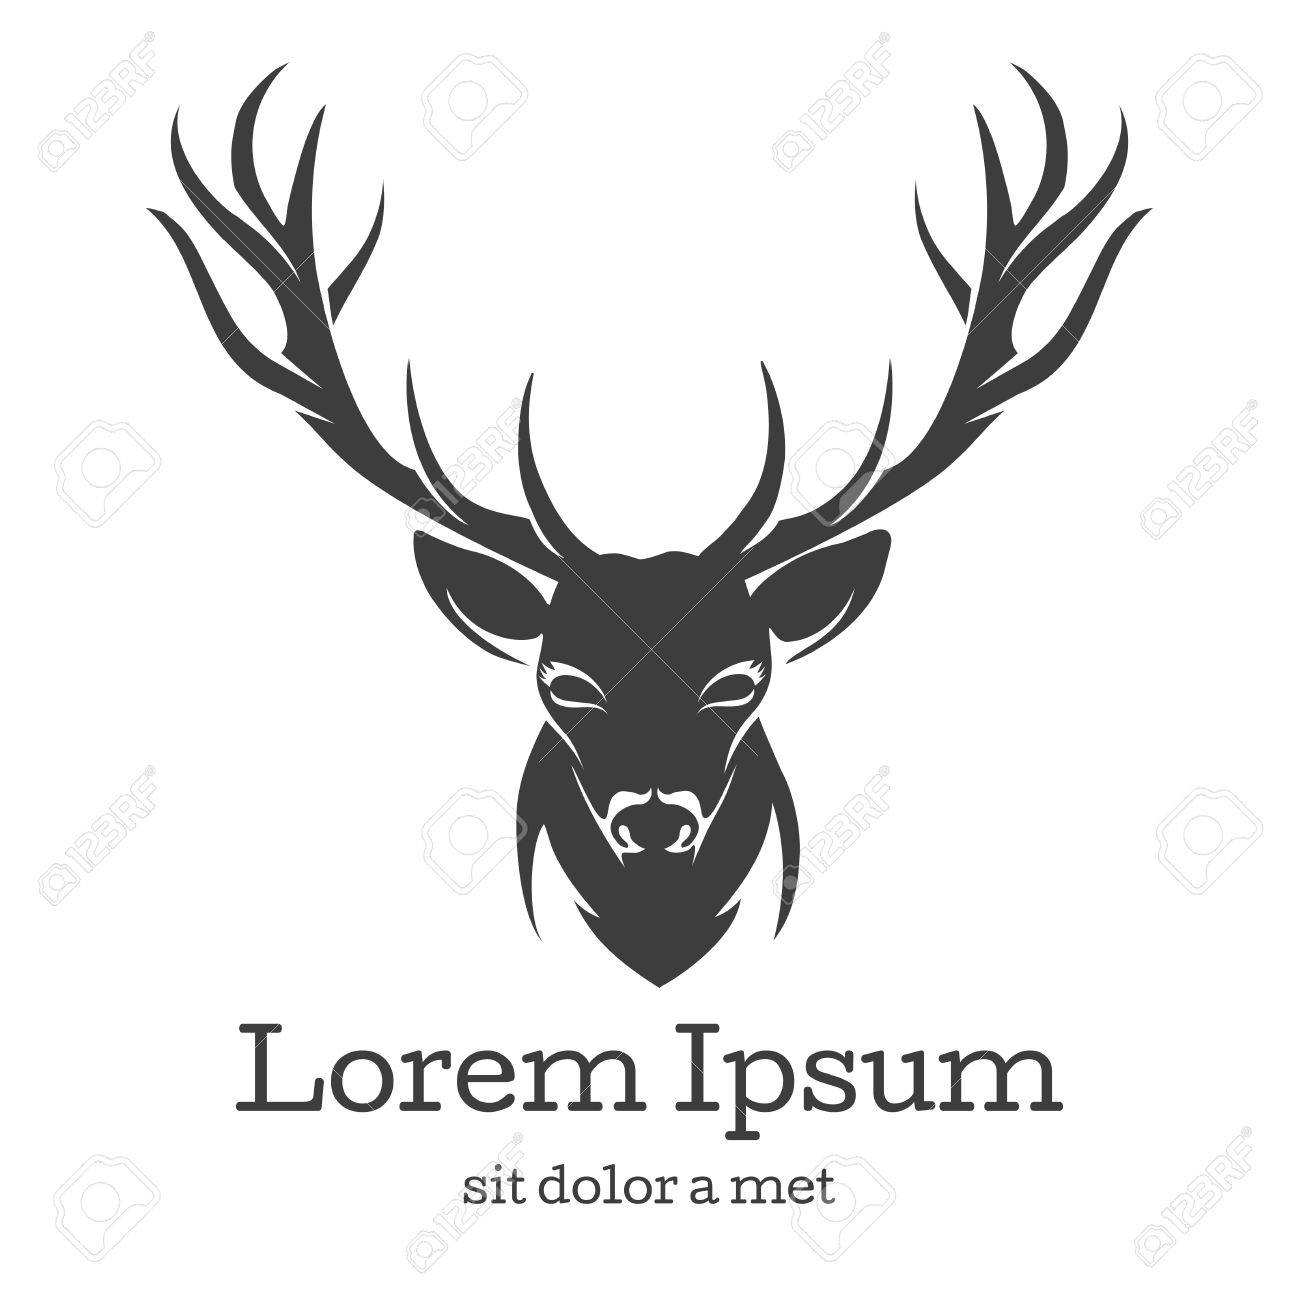 Deer Head Emblem Animal With Horn Nature Wildlife Mammal Reindeer Vector Illustration